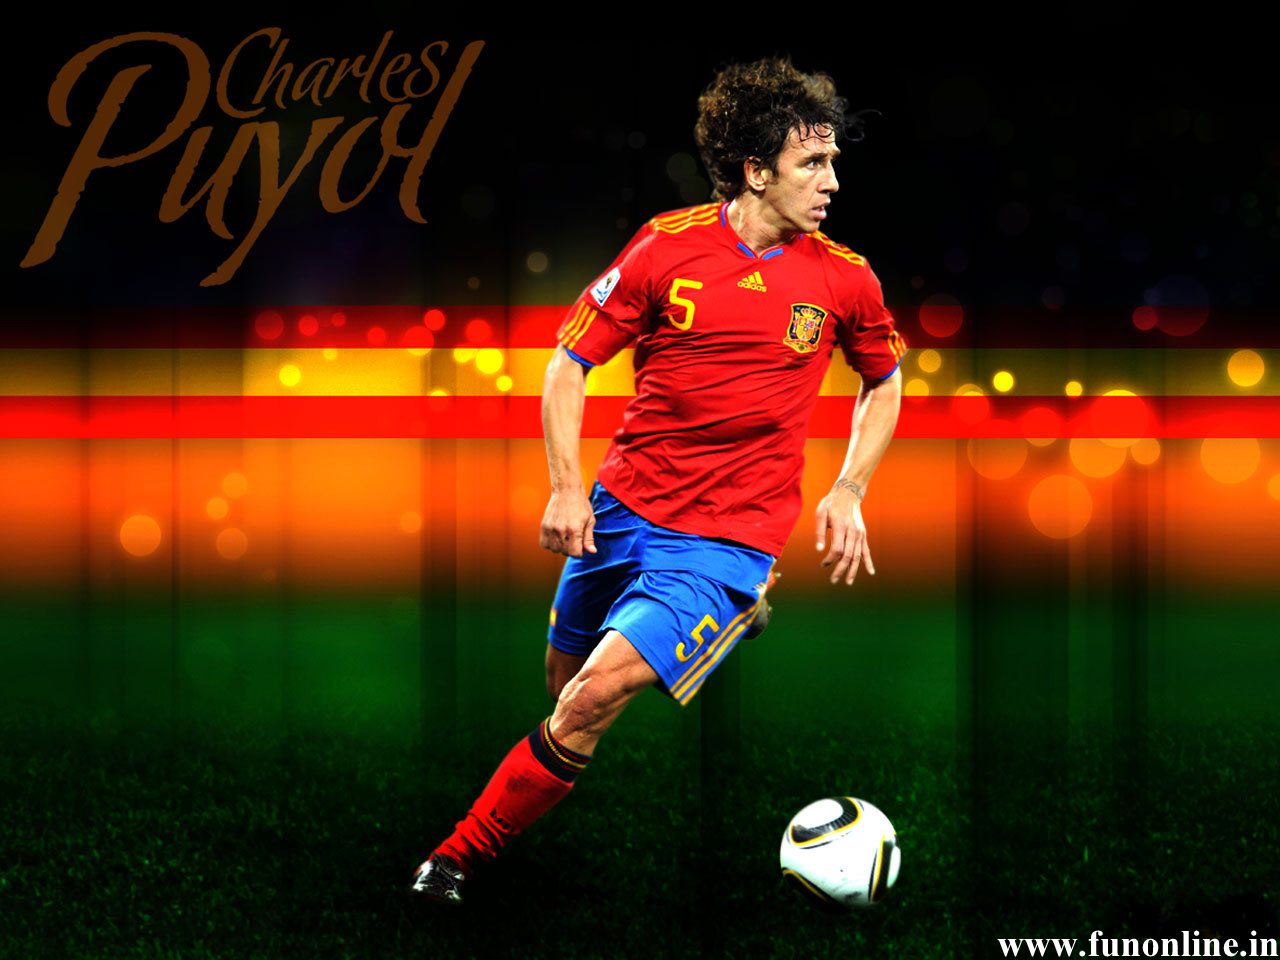 Gerrard Hd Wallpaper Sports Carlos Puyol Profile And Images Photos 2012